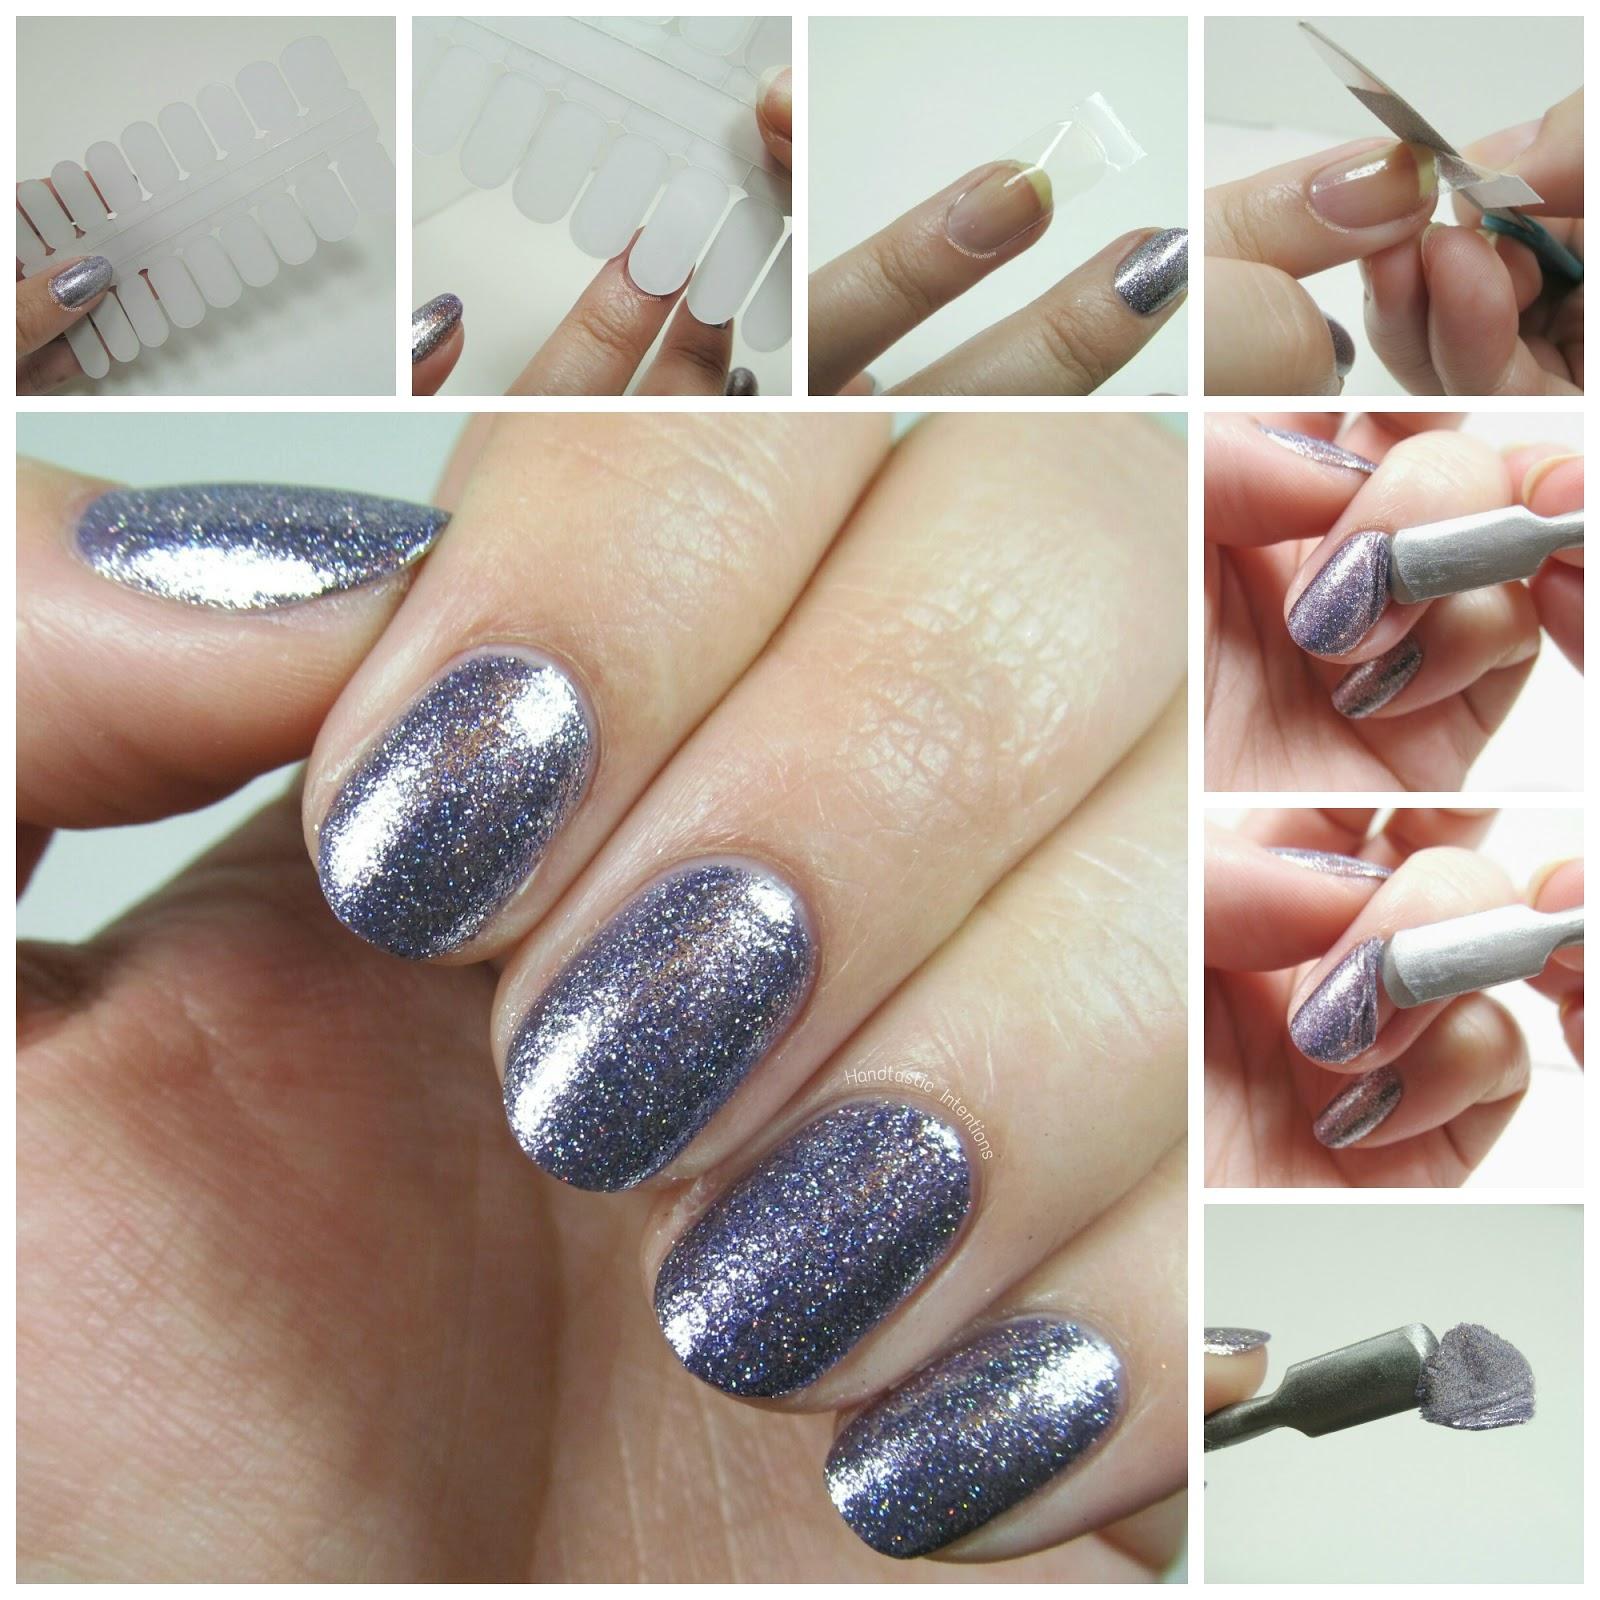 Handtastic Intentions: Nail Guards by Nail Bliss